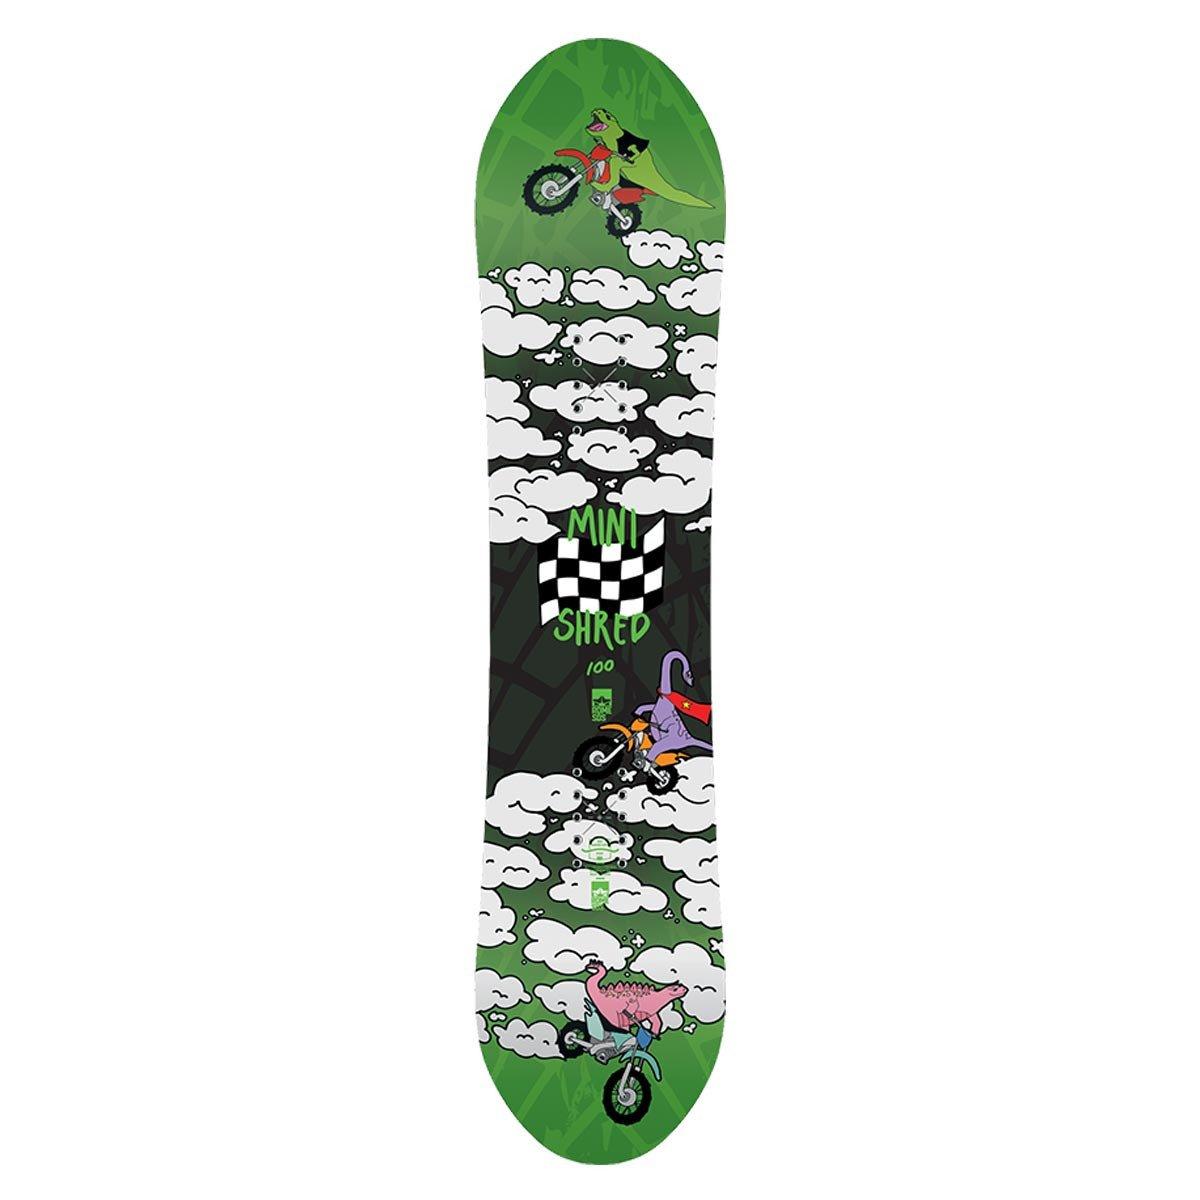 2020 Rome MiniShred Junior Snowboard